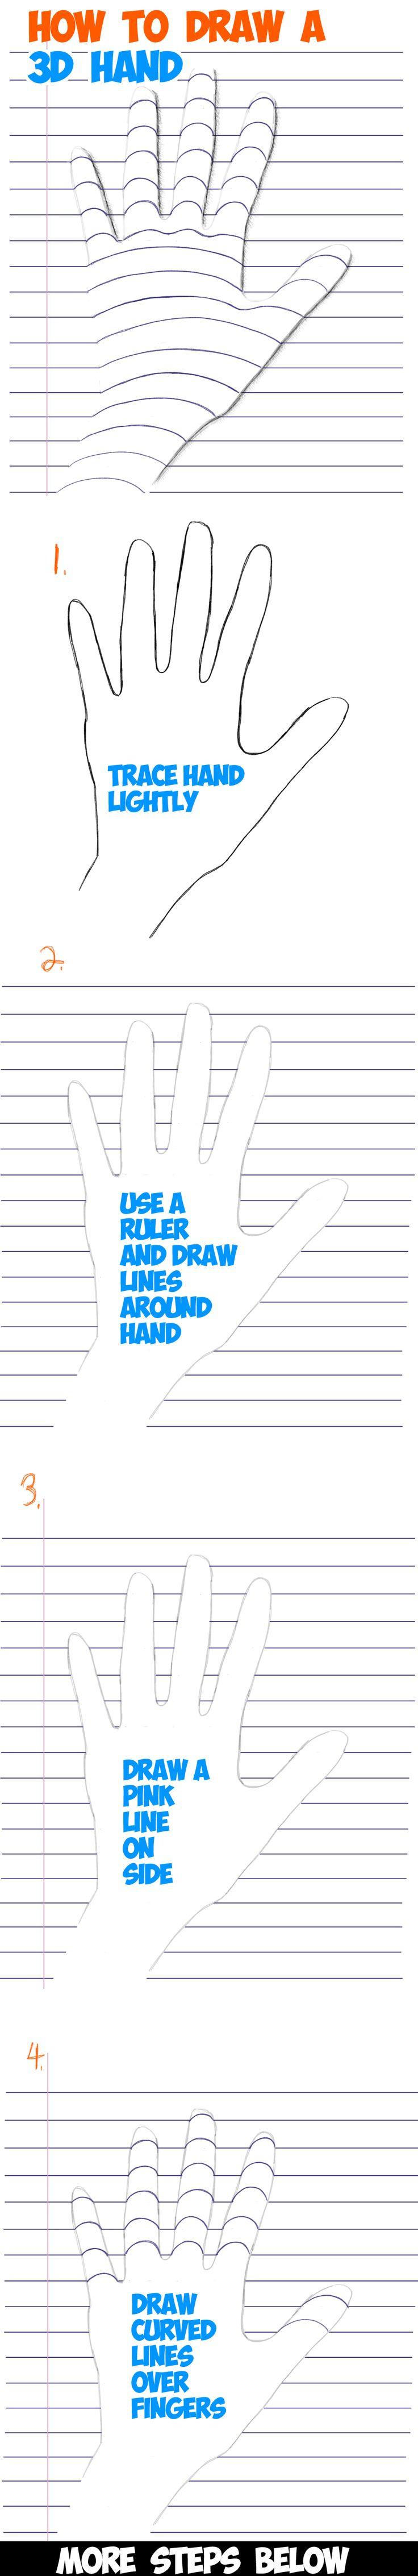 Best 25 3d drawing techniques ideas on pinterest 3d for 3d drawing online